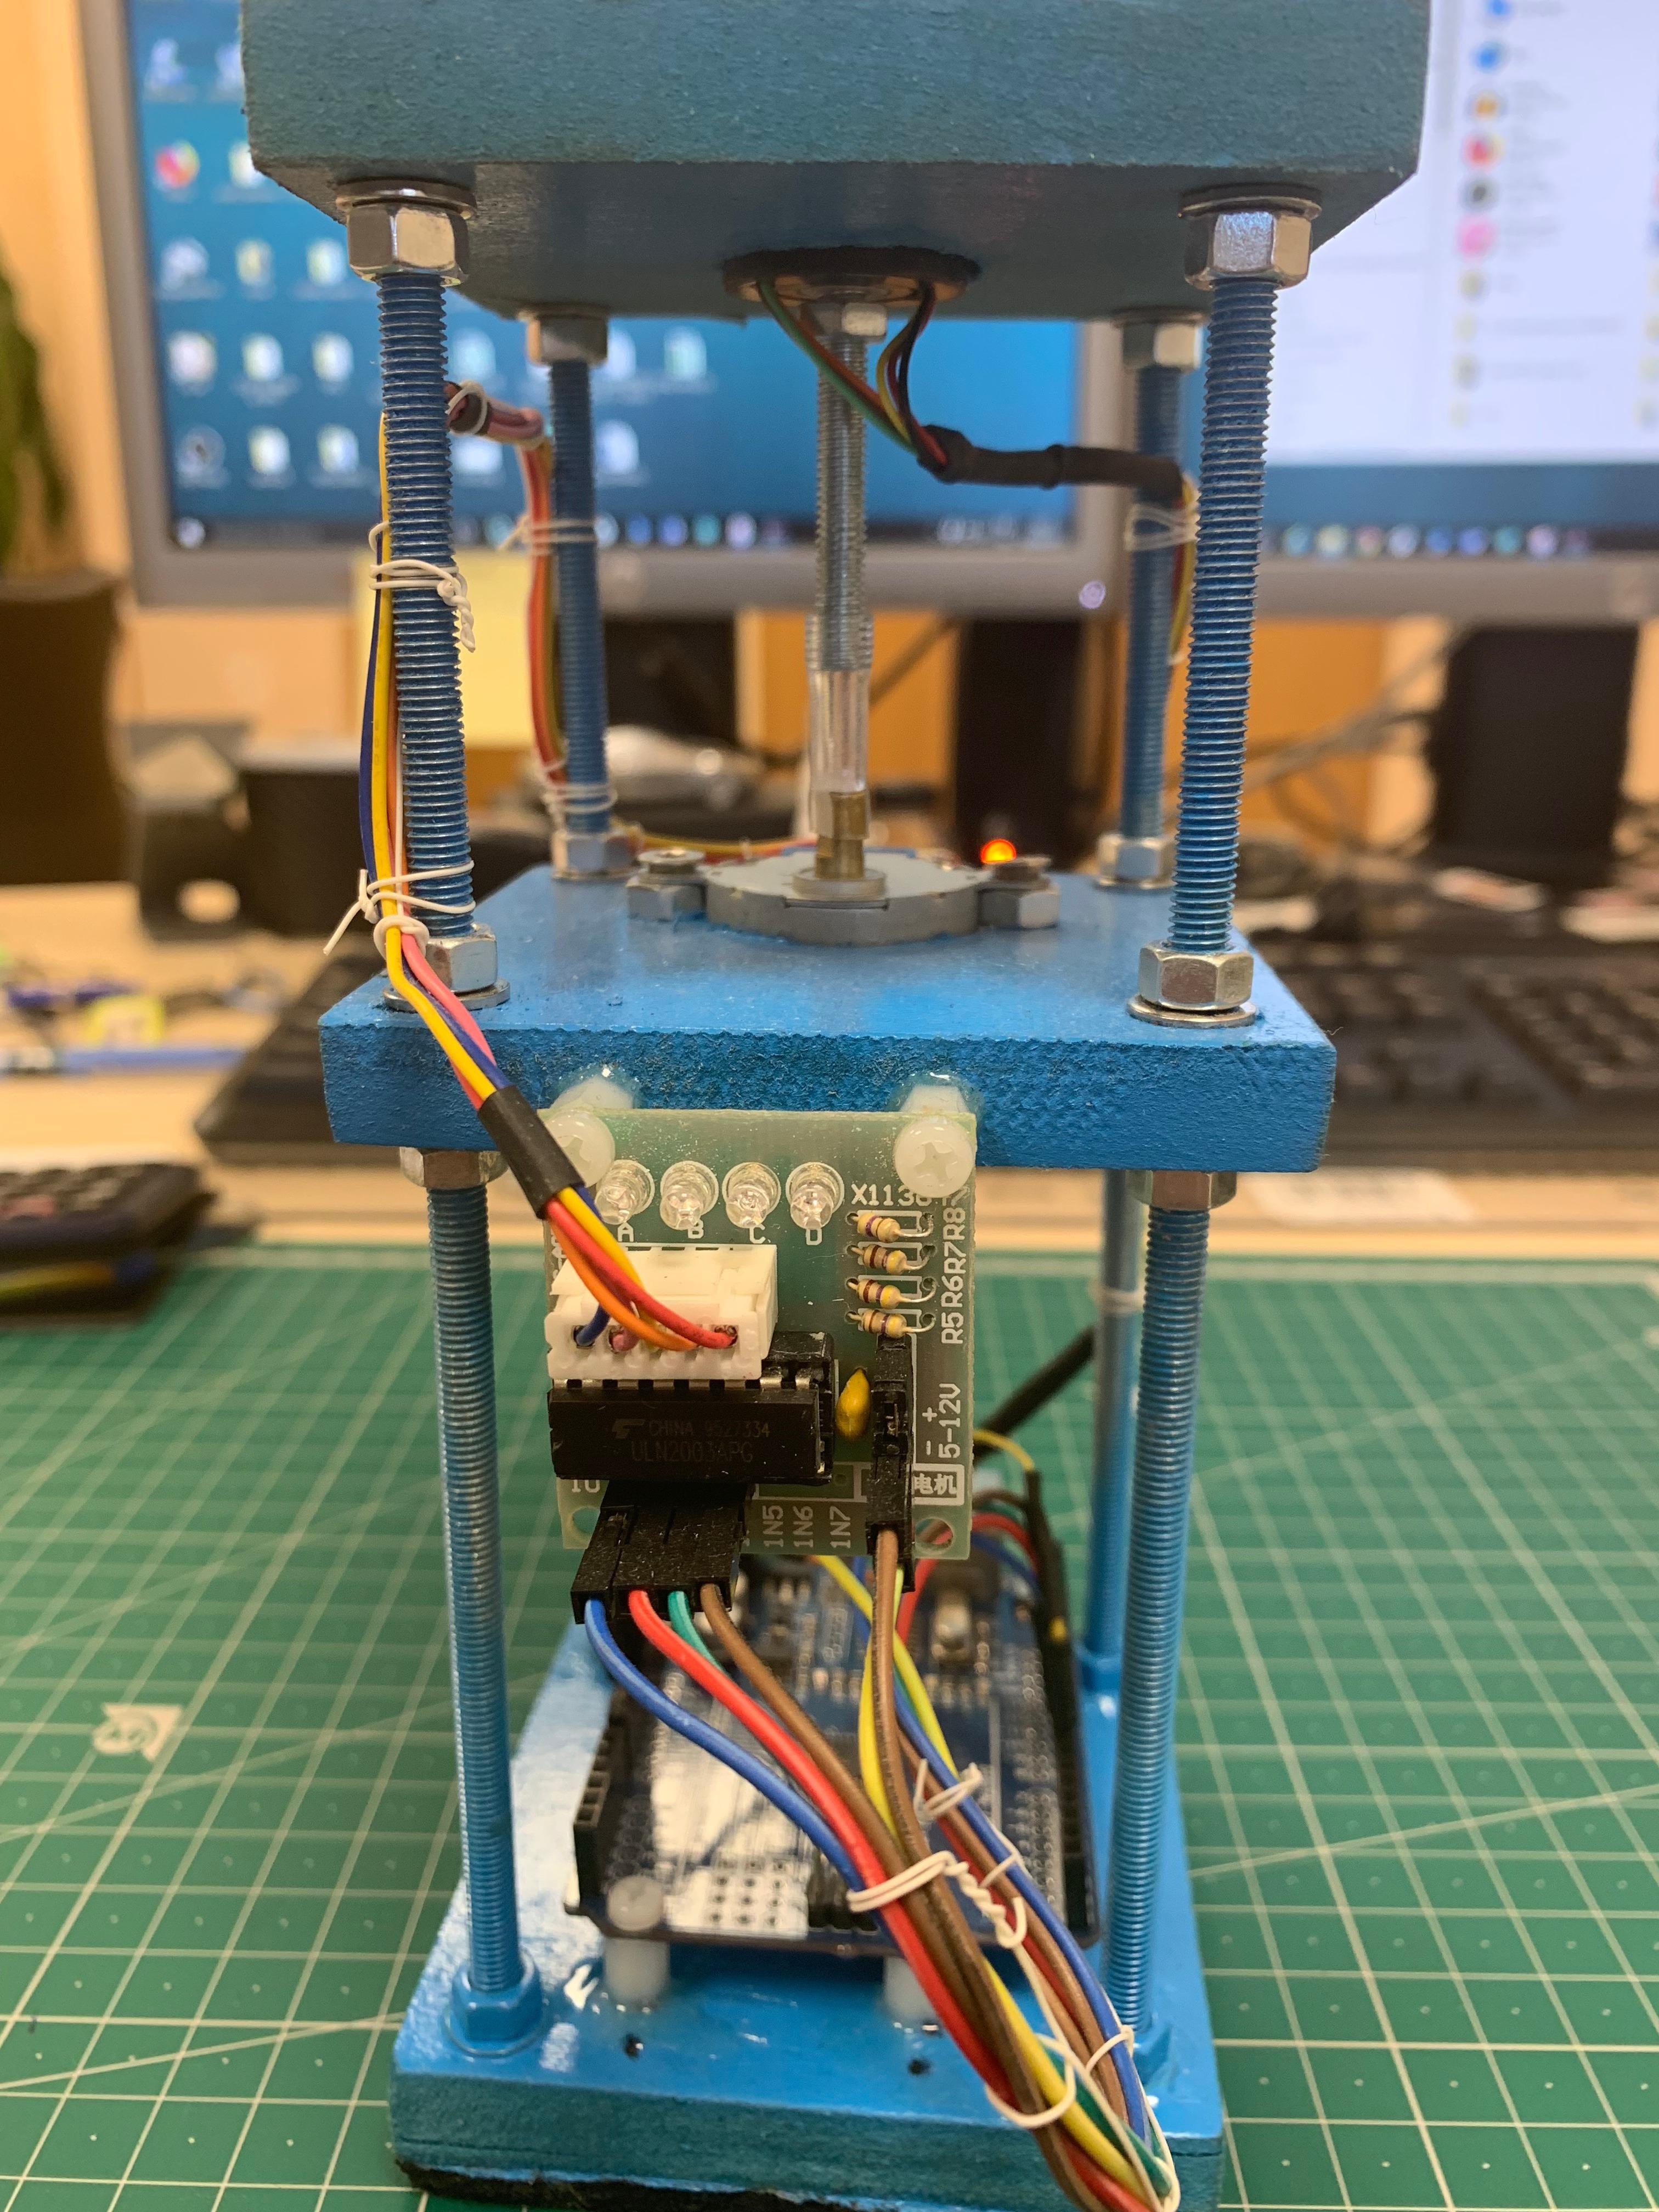 DIY 360 Degree SODAR Device